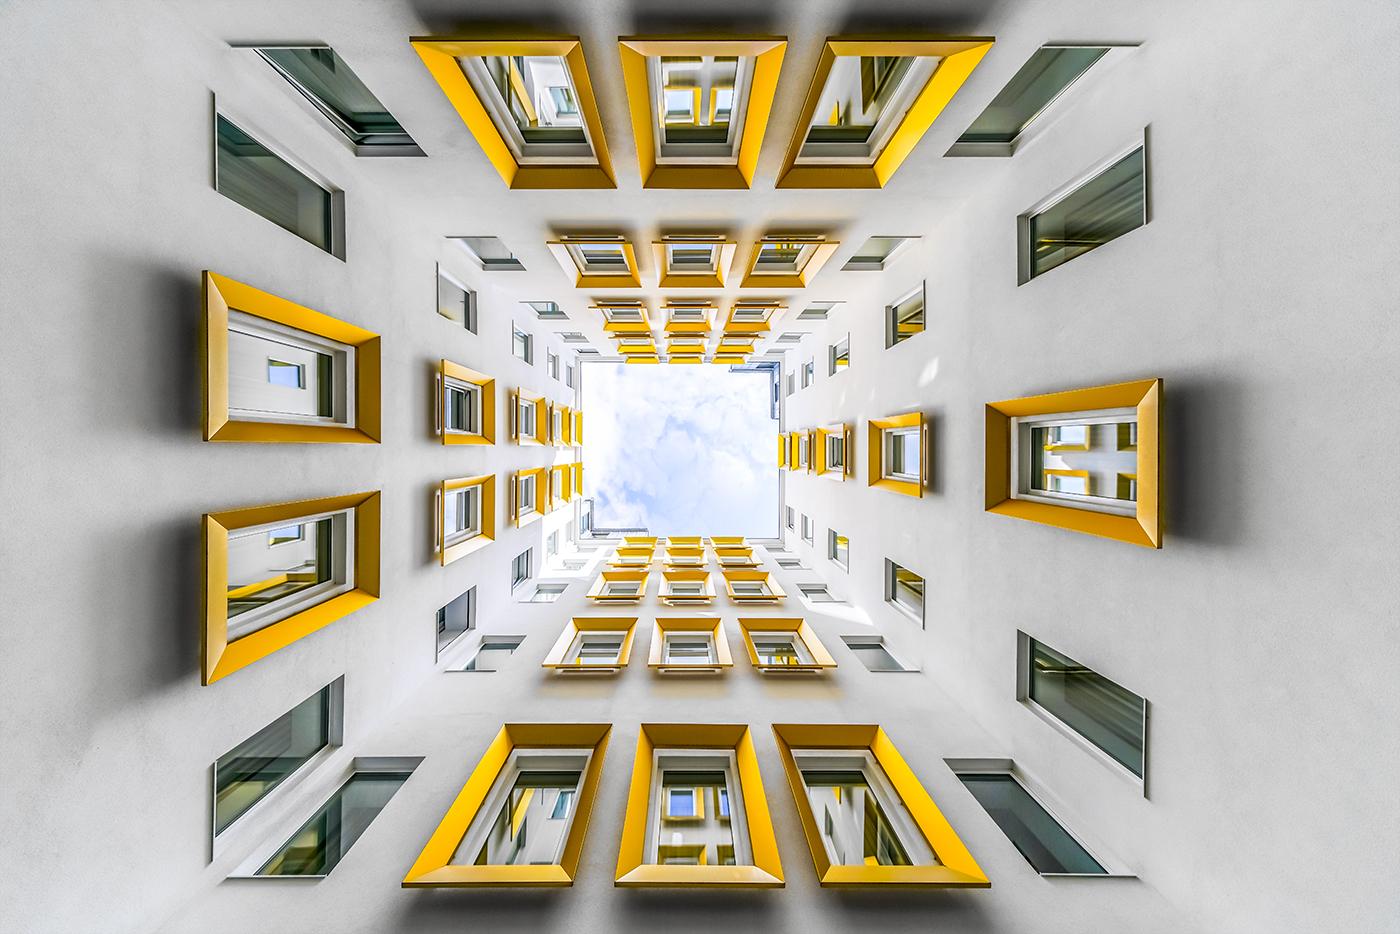 Viennametry por Zsolt Hlinka